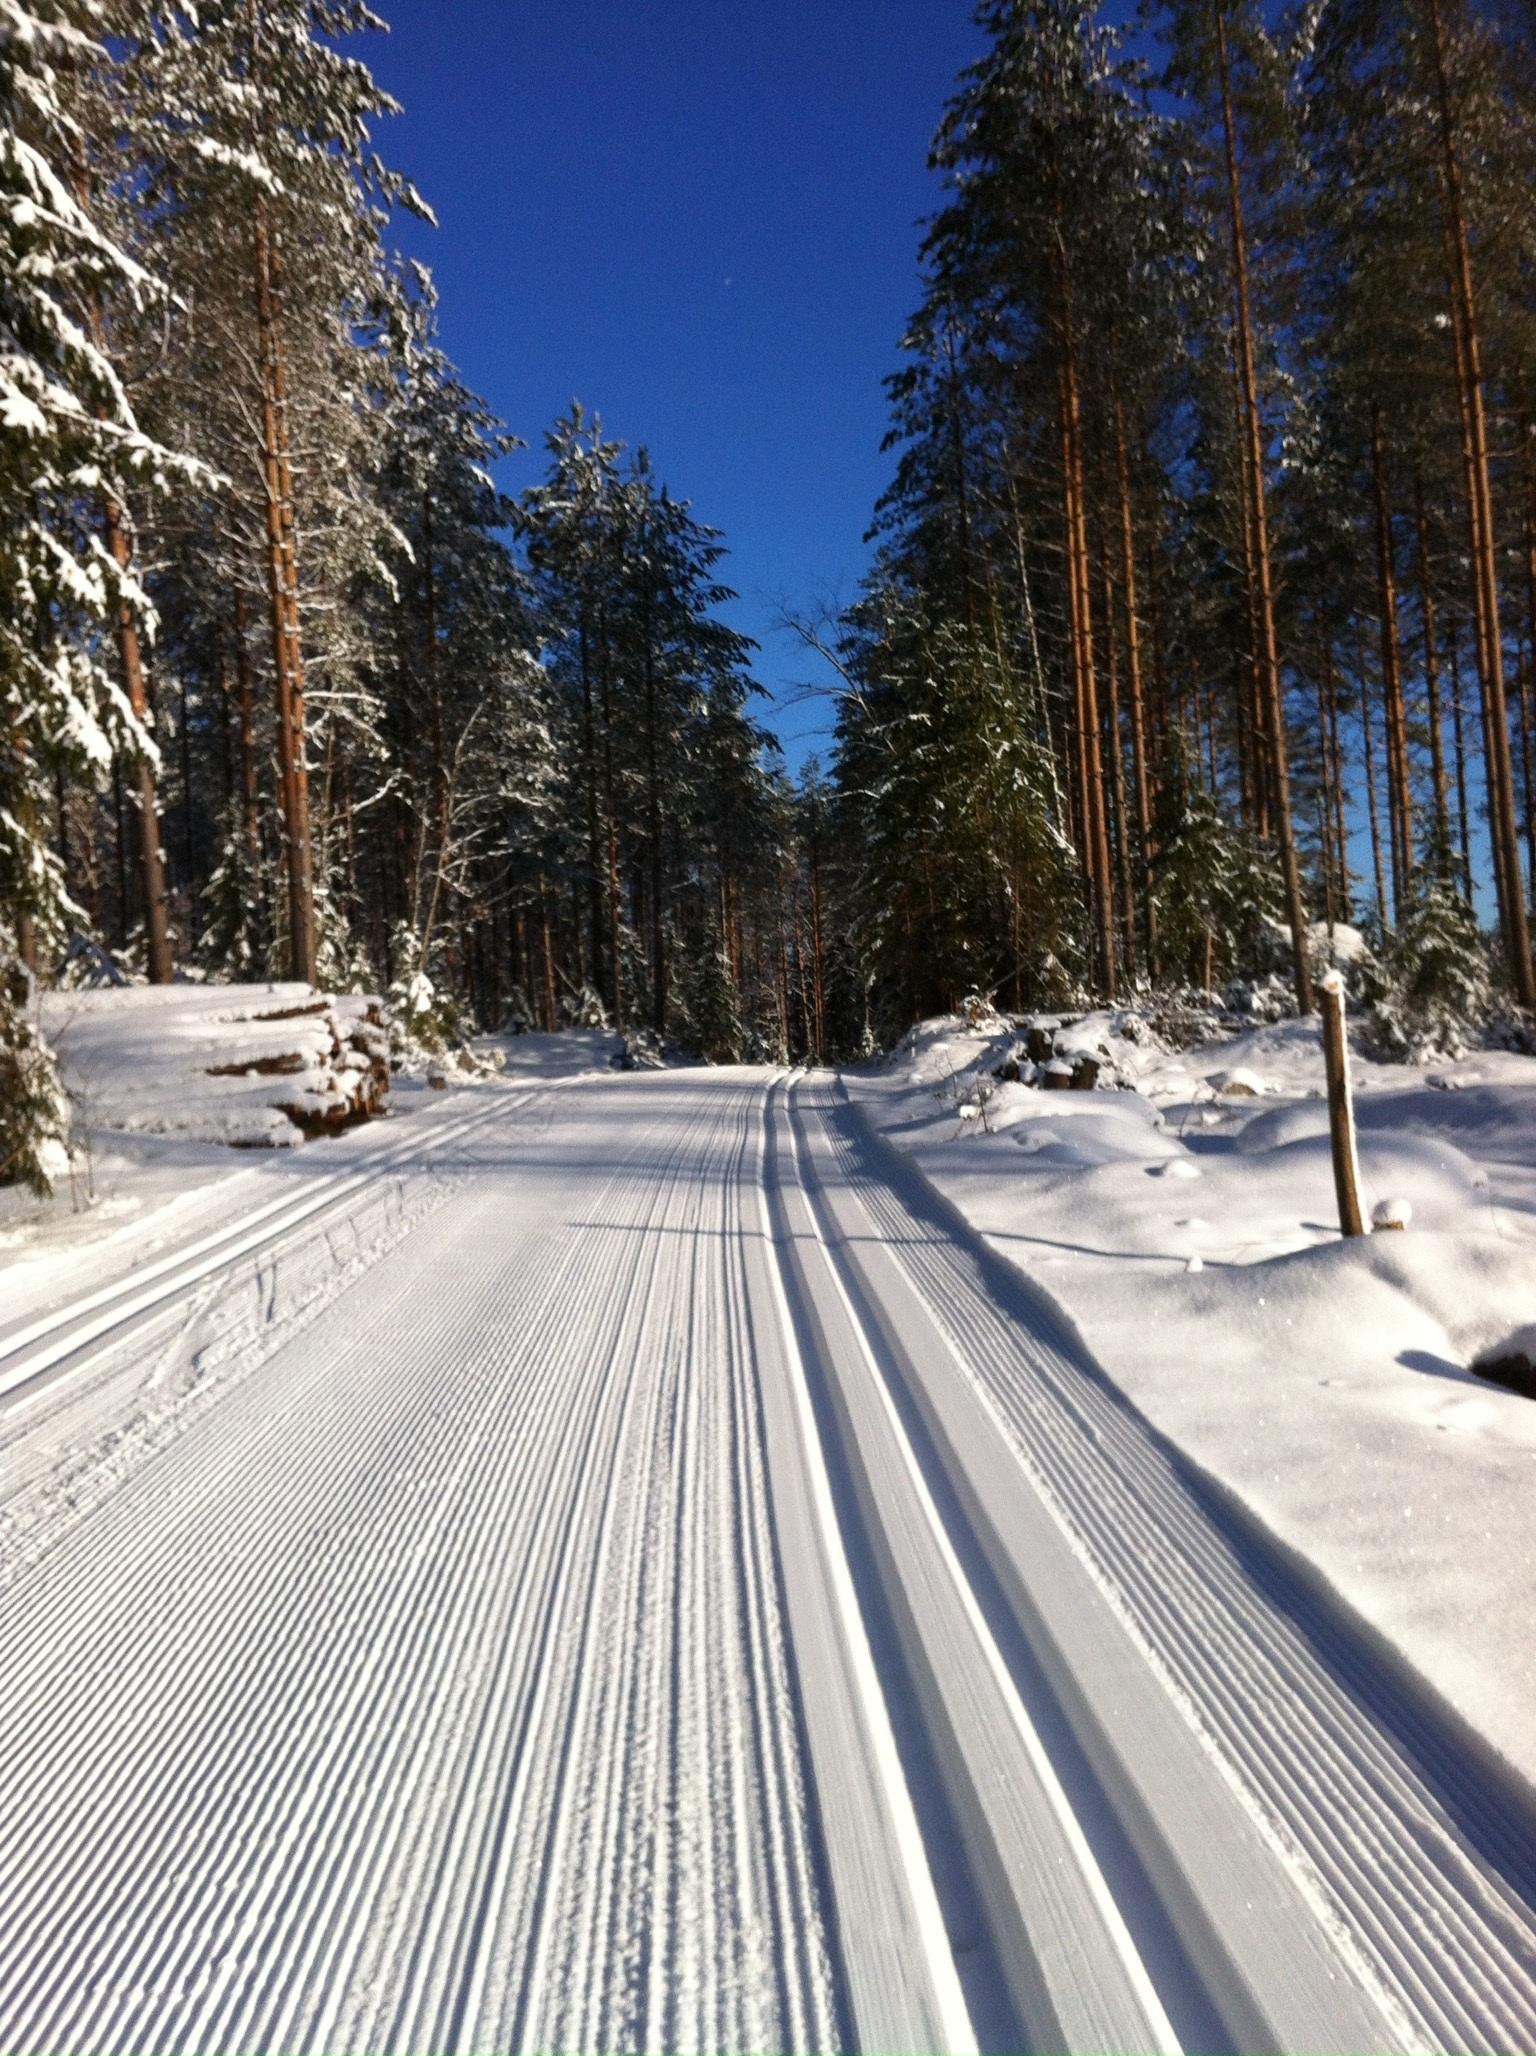 Картинки снега и лыж